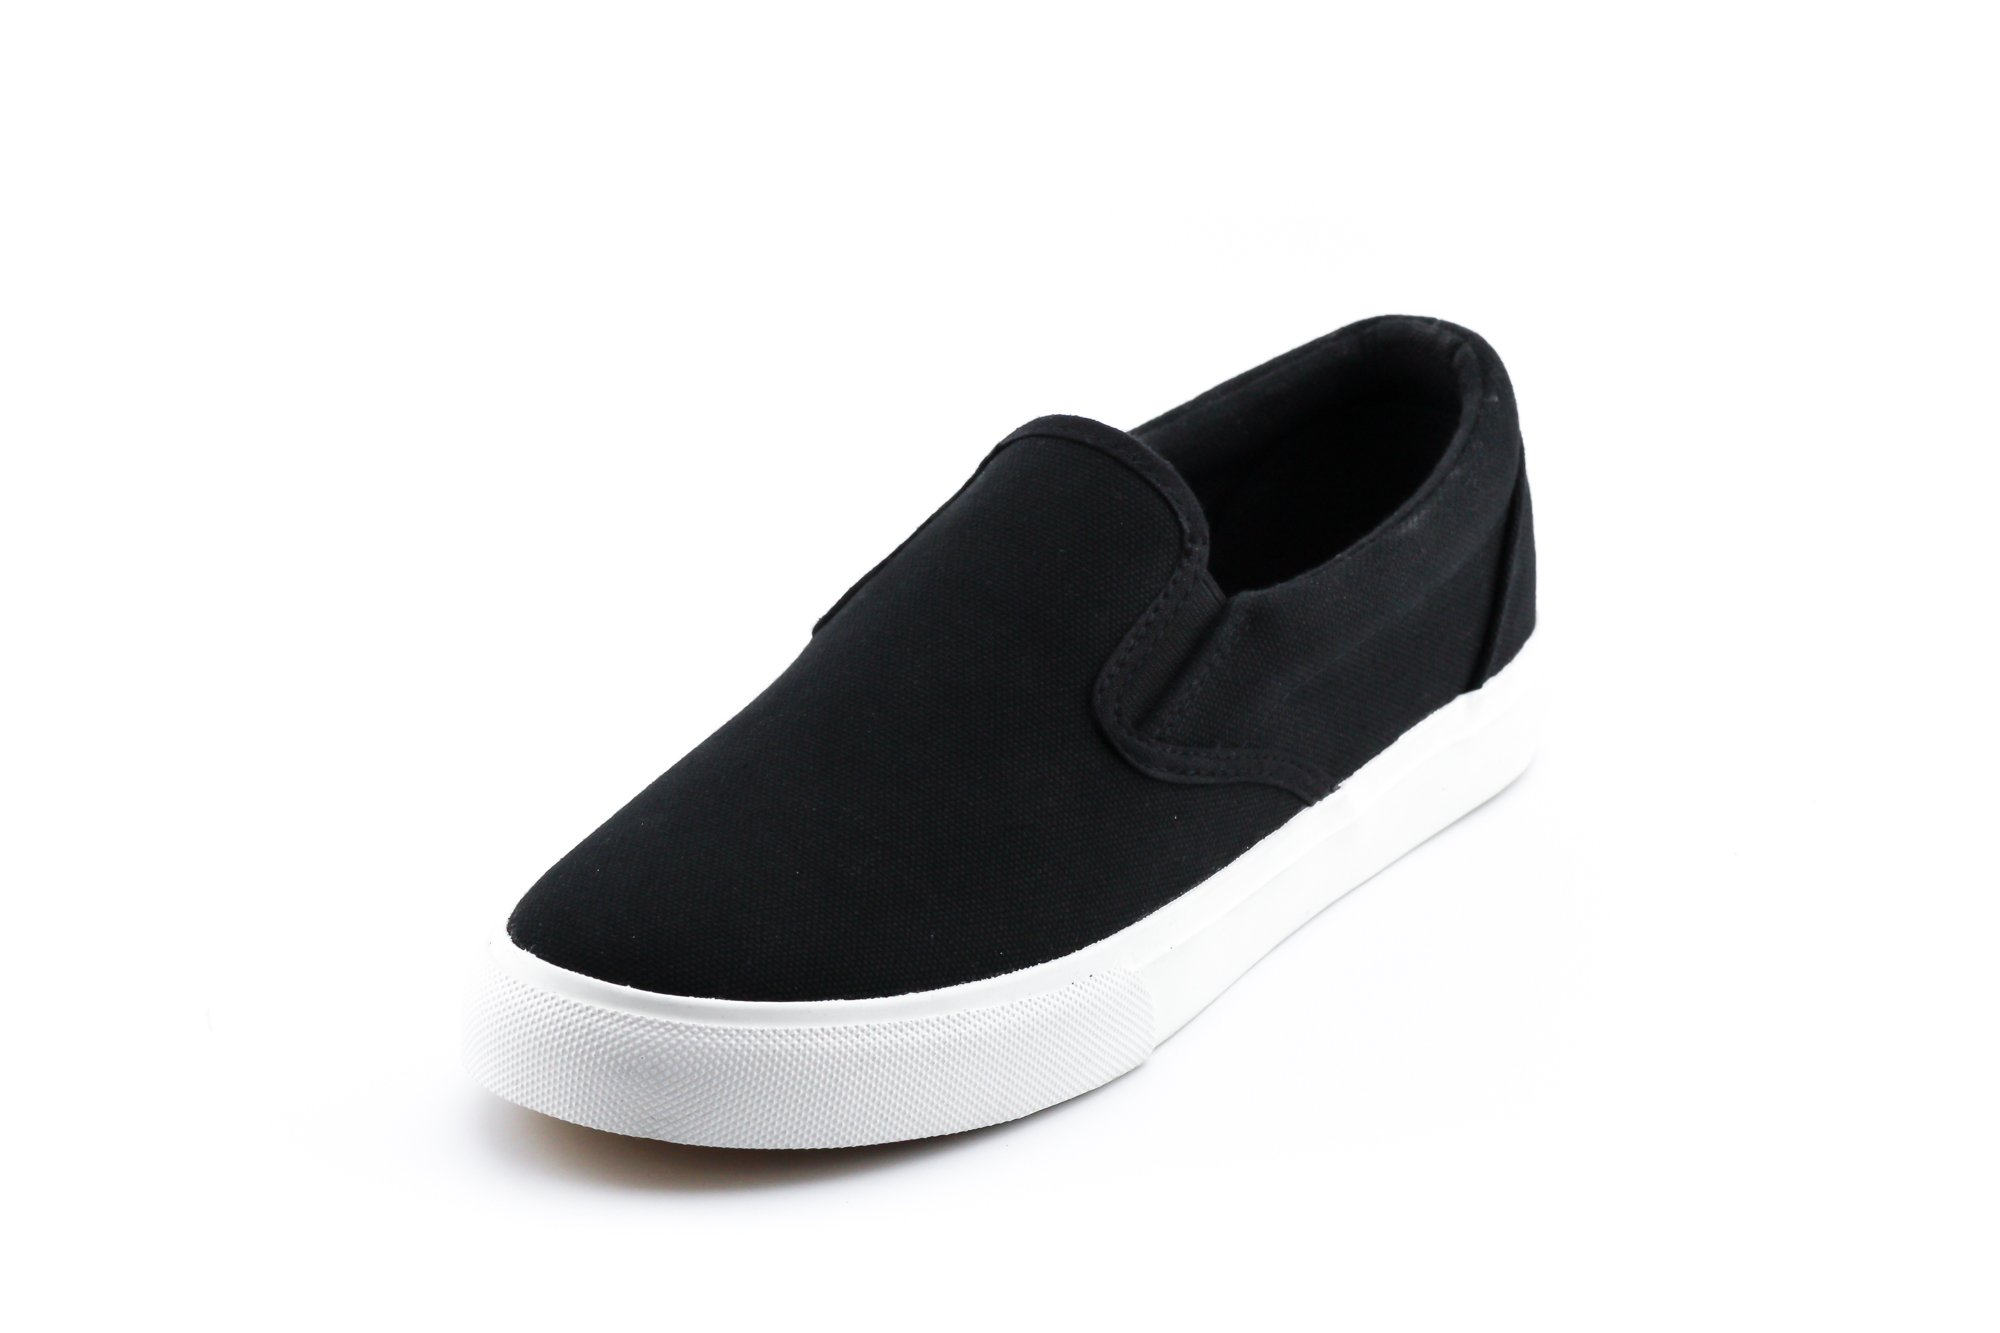 CALICO KIKI HALLIE-CK01 Women's Slip On Canvas Sneakers Casual Comfort (8.5 US Black)